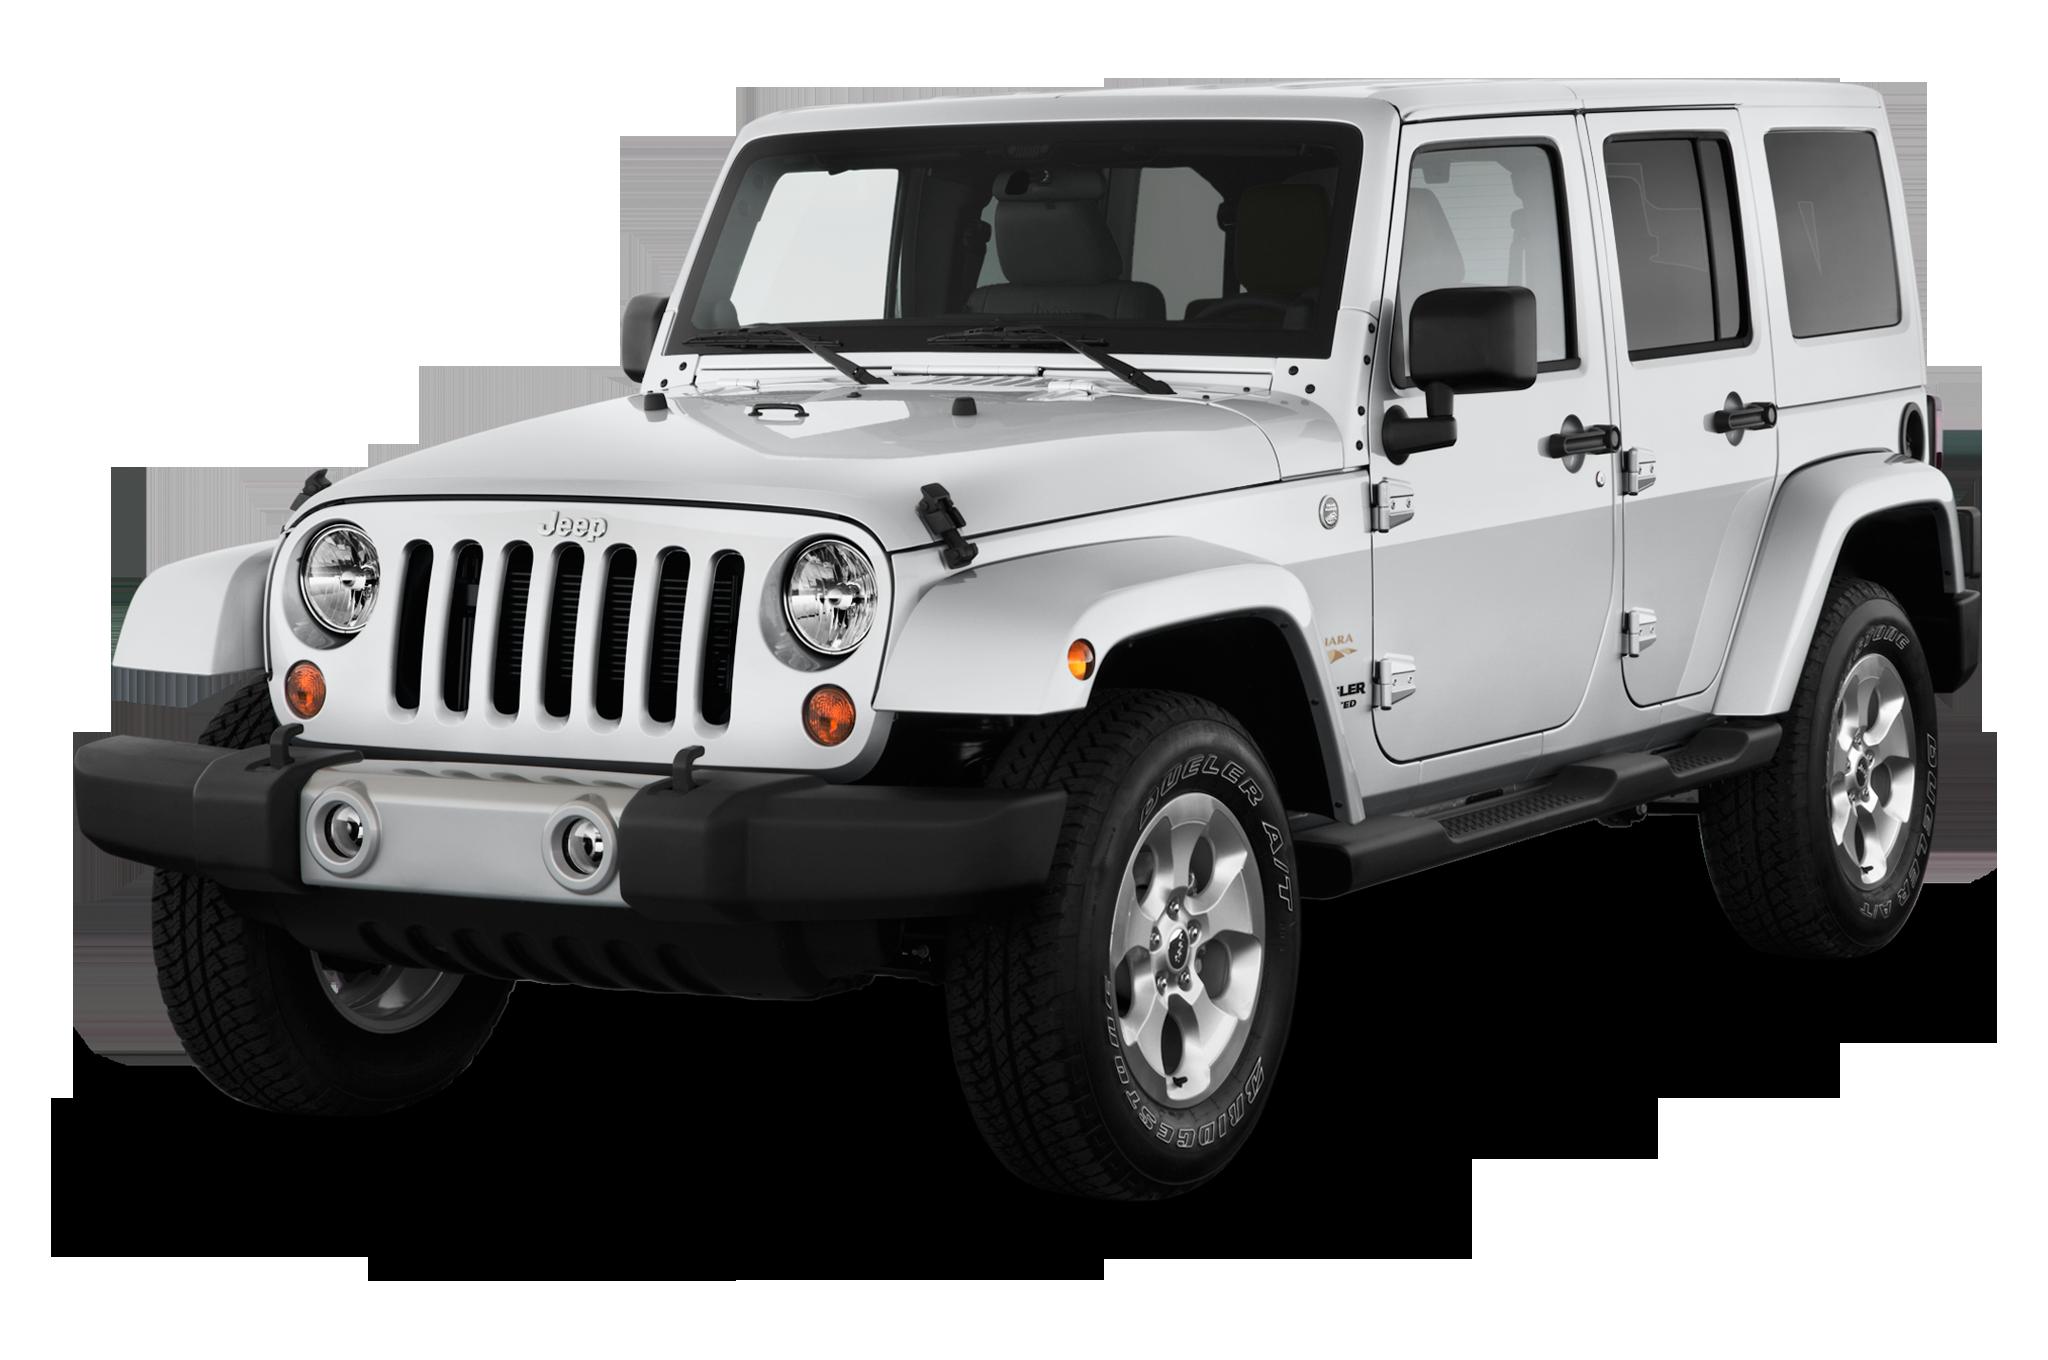 jeep sahara dragon 2015 autos post. Black Bedroom Furniture Sets. Home Design Ideas